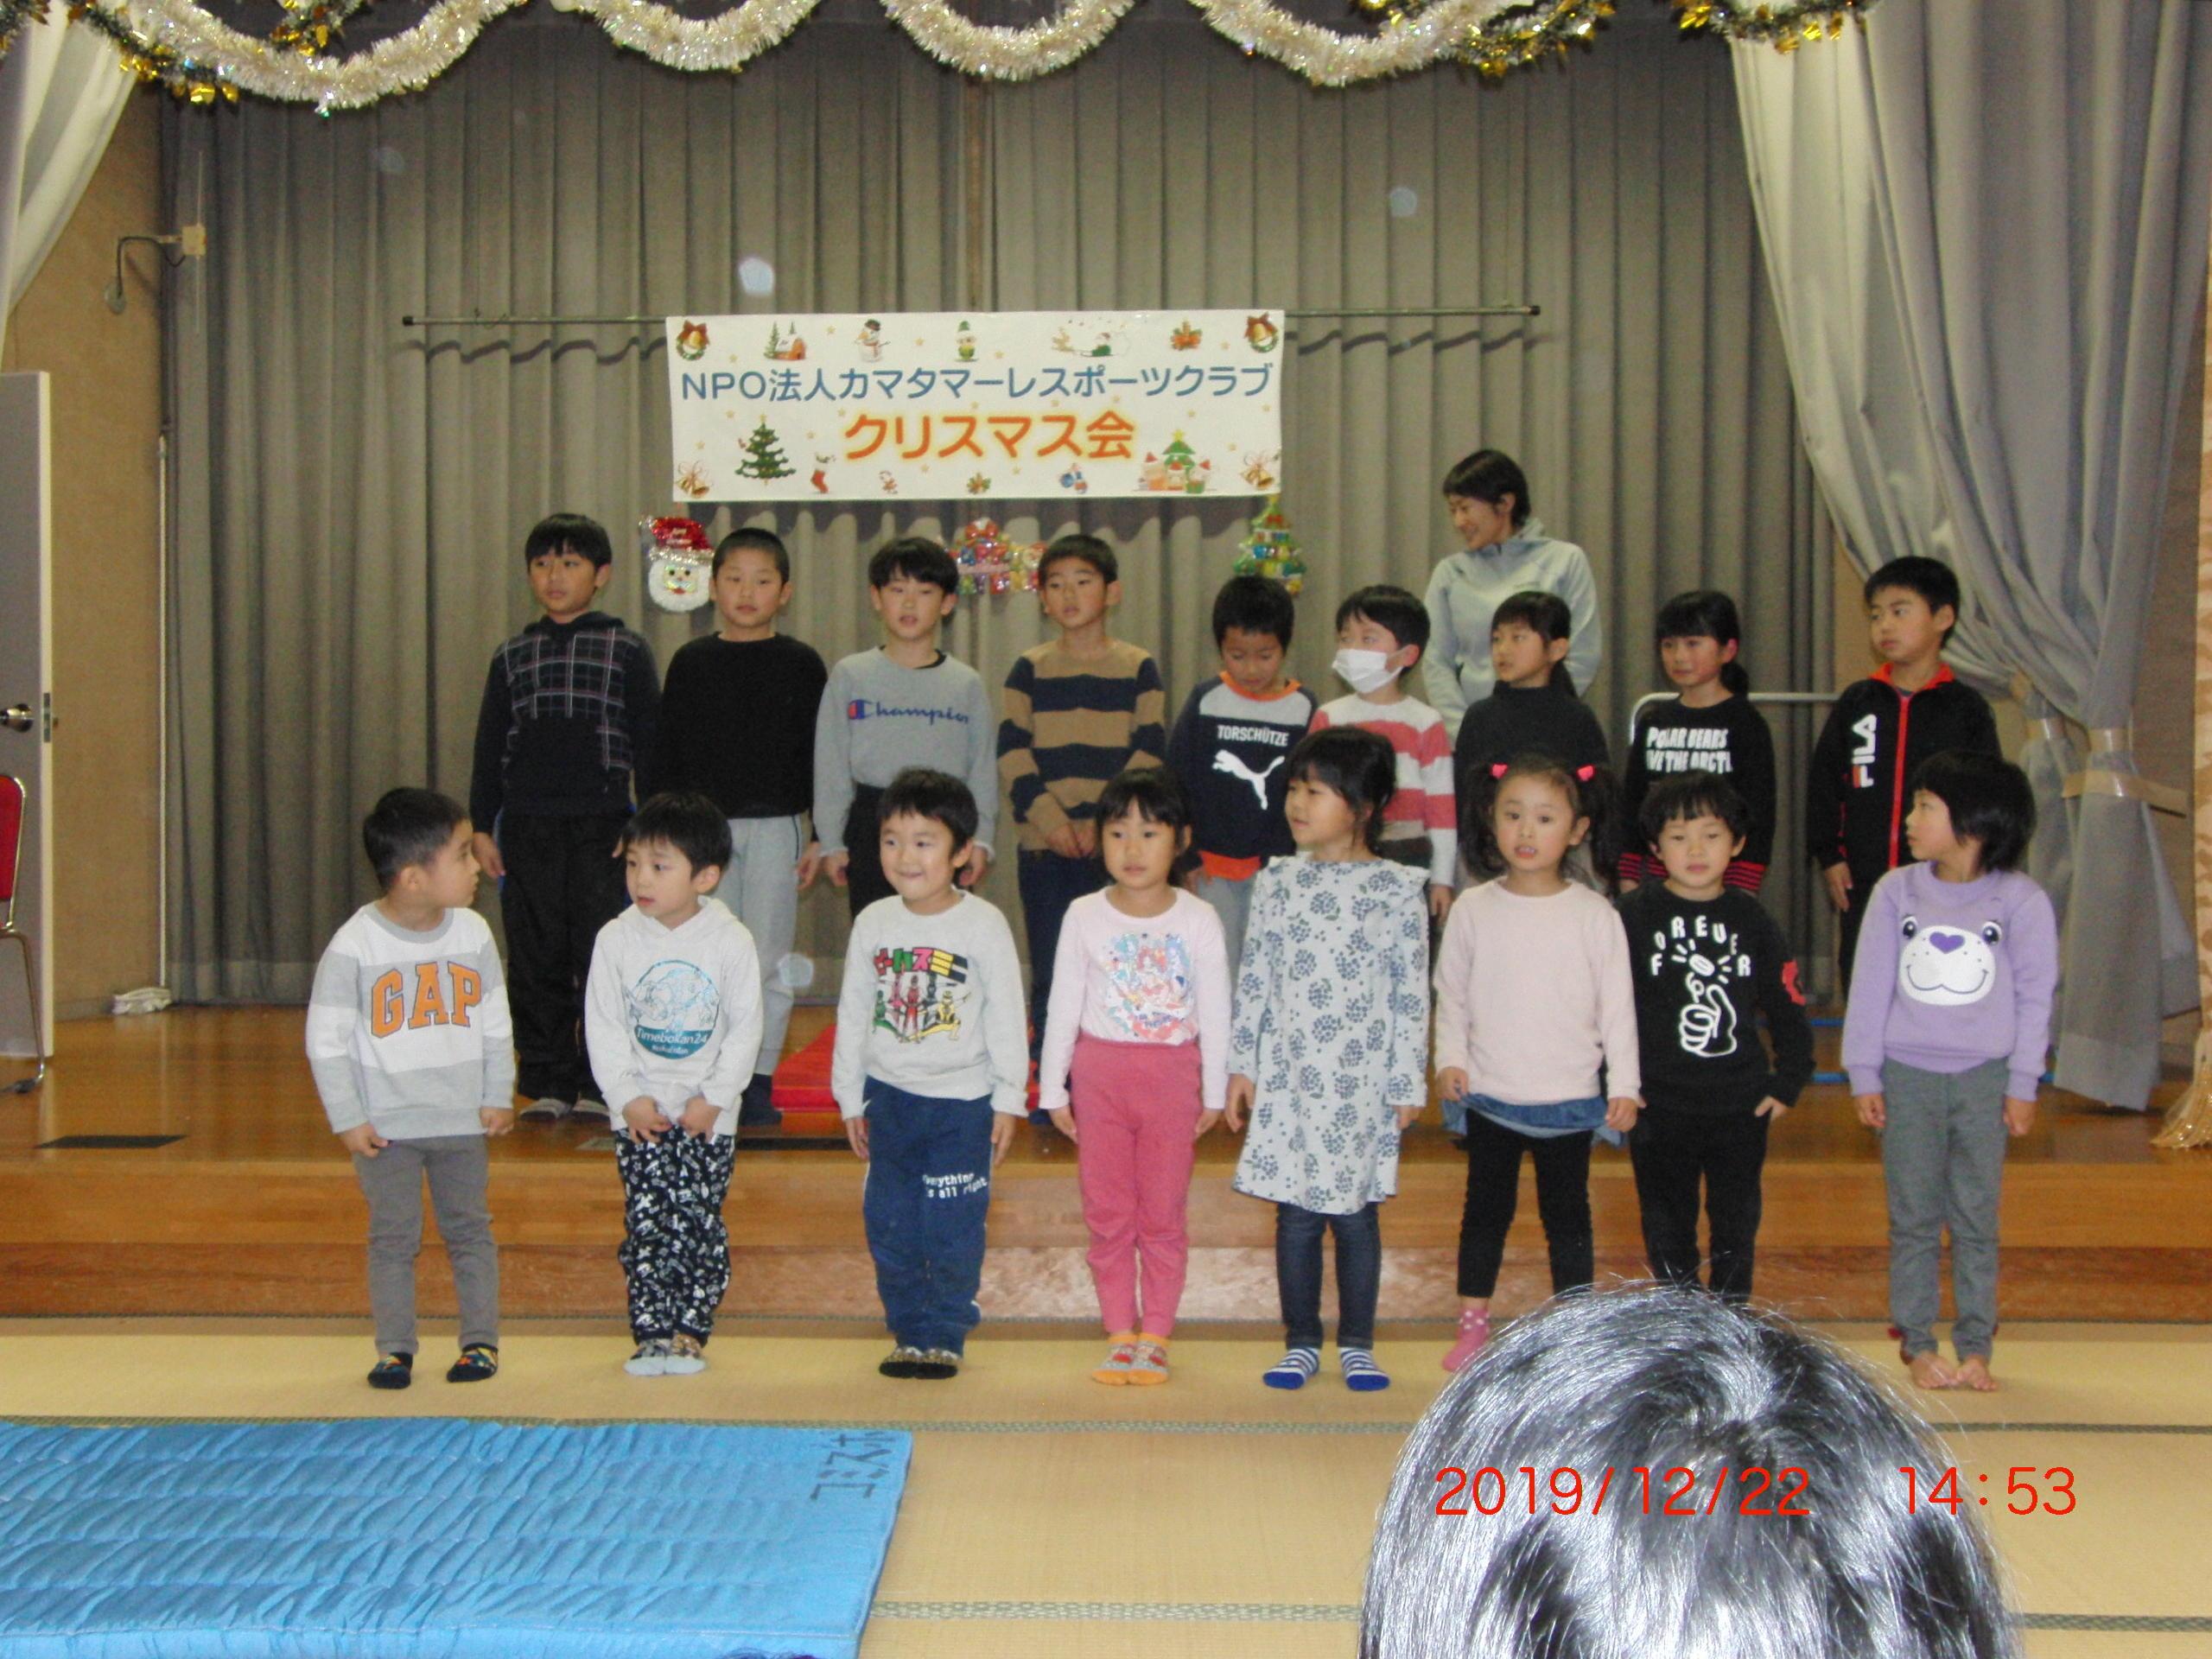 https://www.kamatamare-npo.jp/news/taisou1.JPG